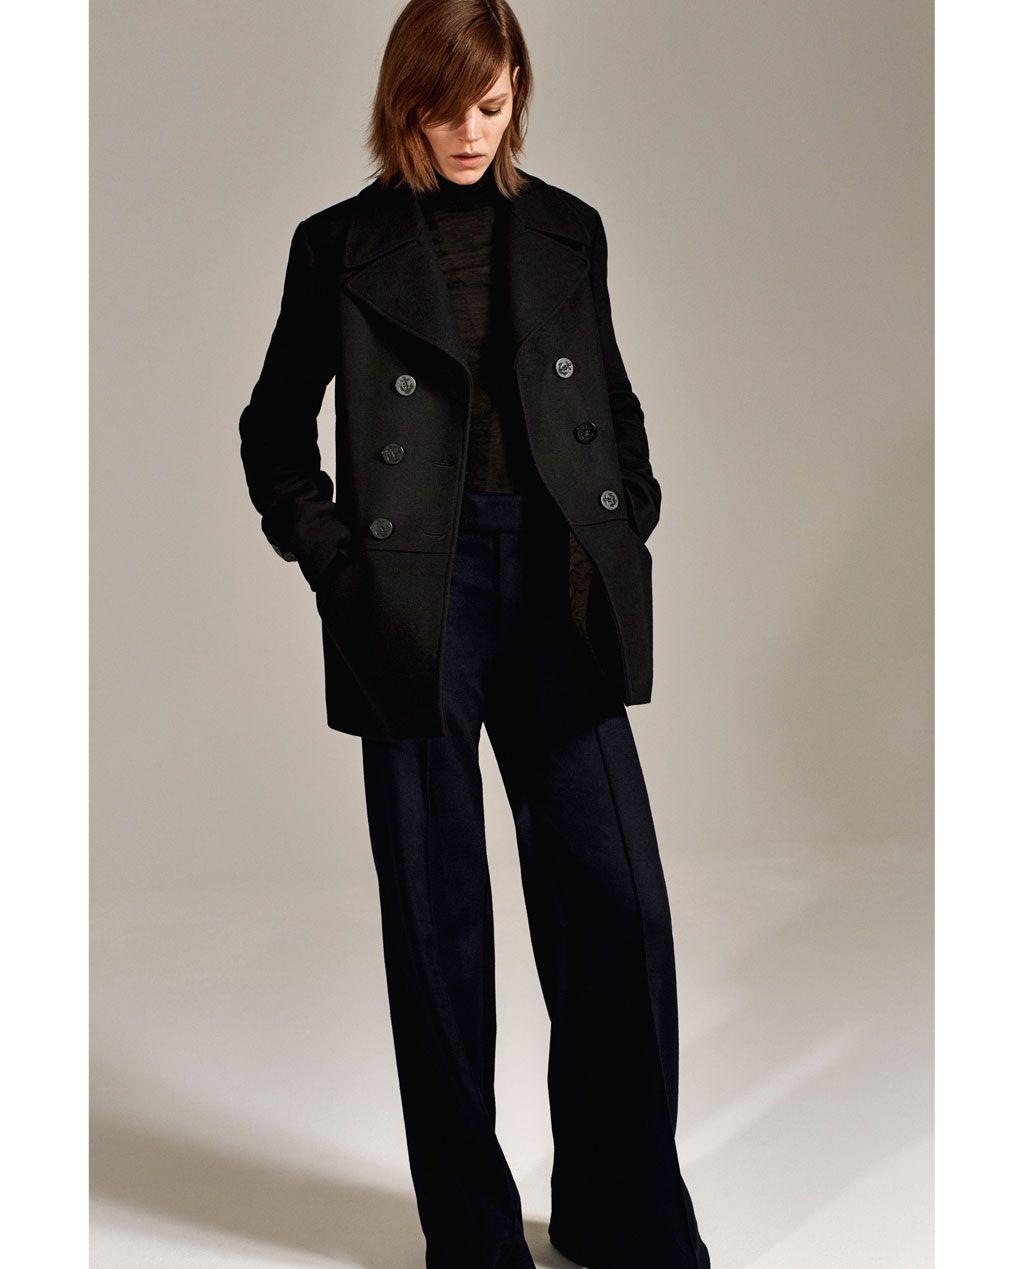 manteau femme zara maroc,Zara maroc nouvelle collection,zara